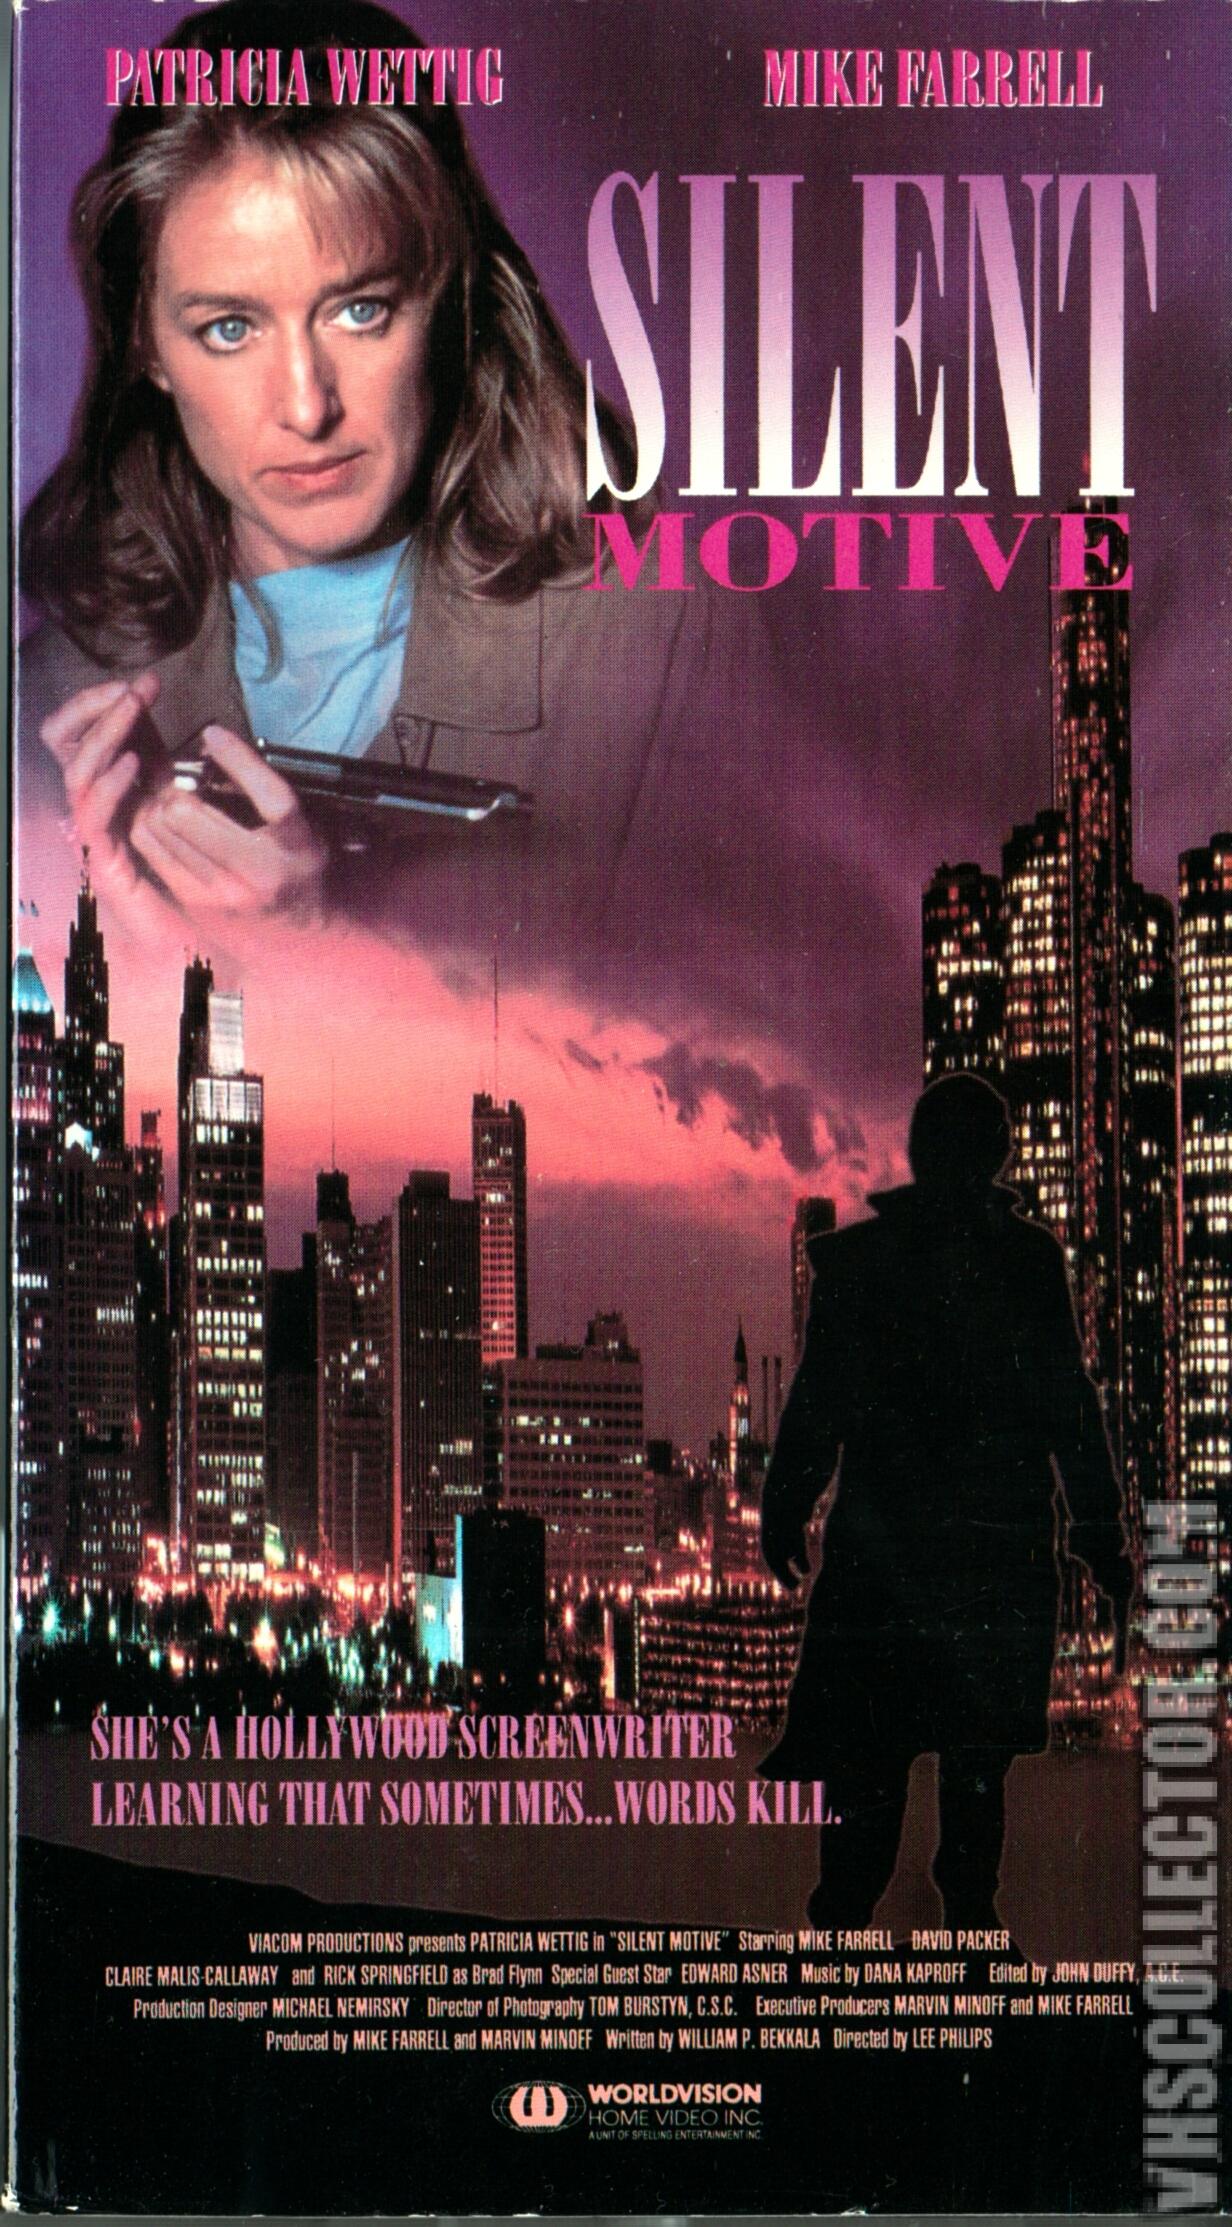 Patricia Wettig in Silent Motive (1991)